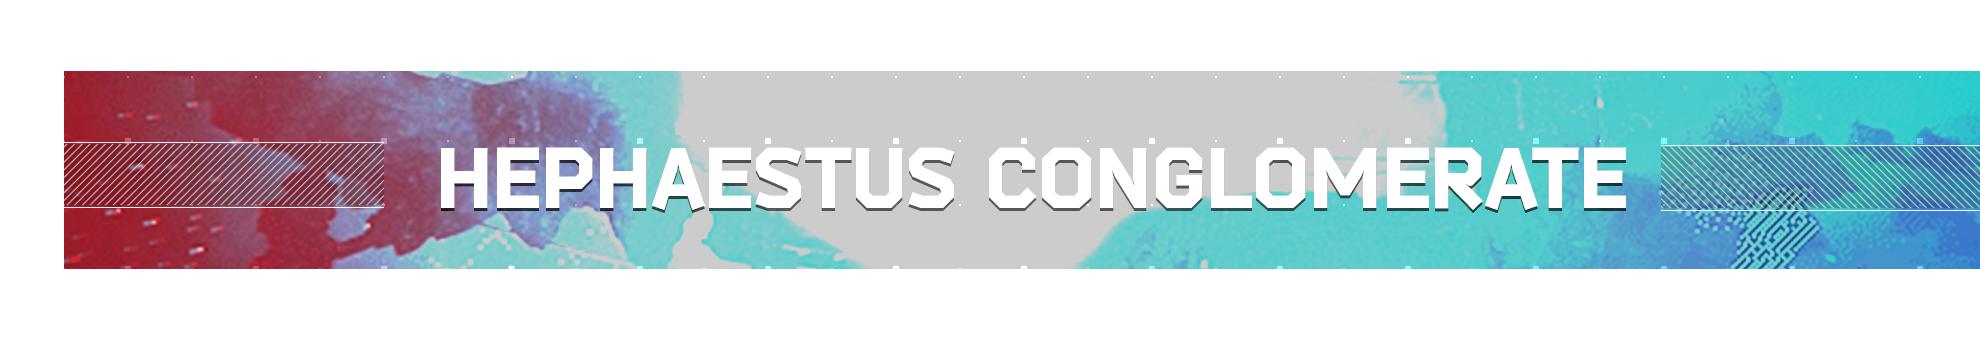 banner hephaestus